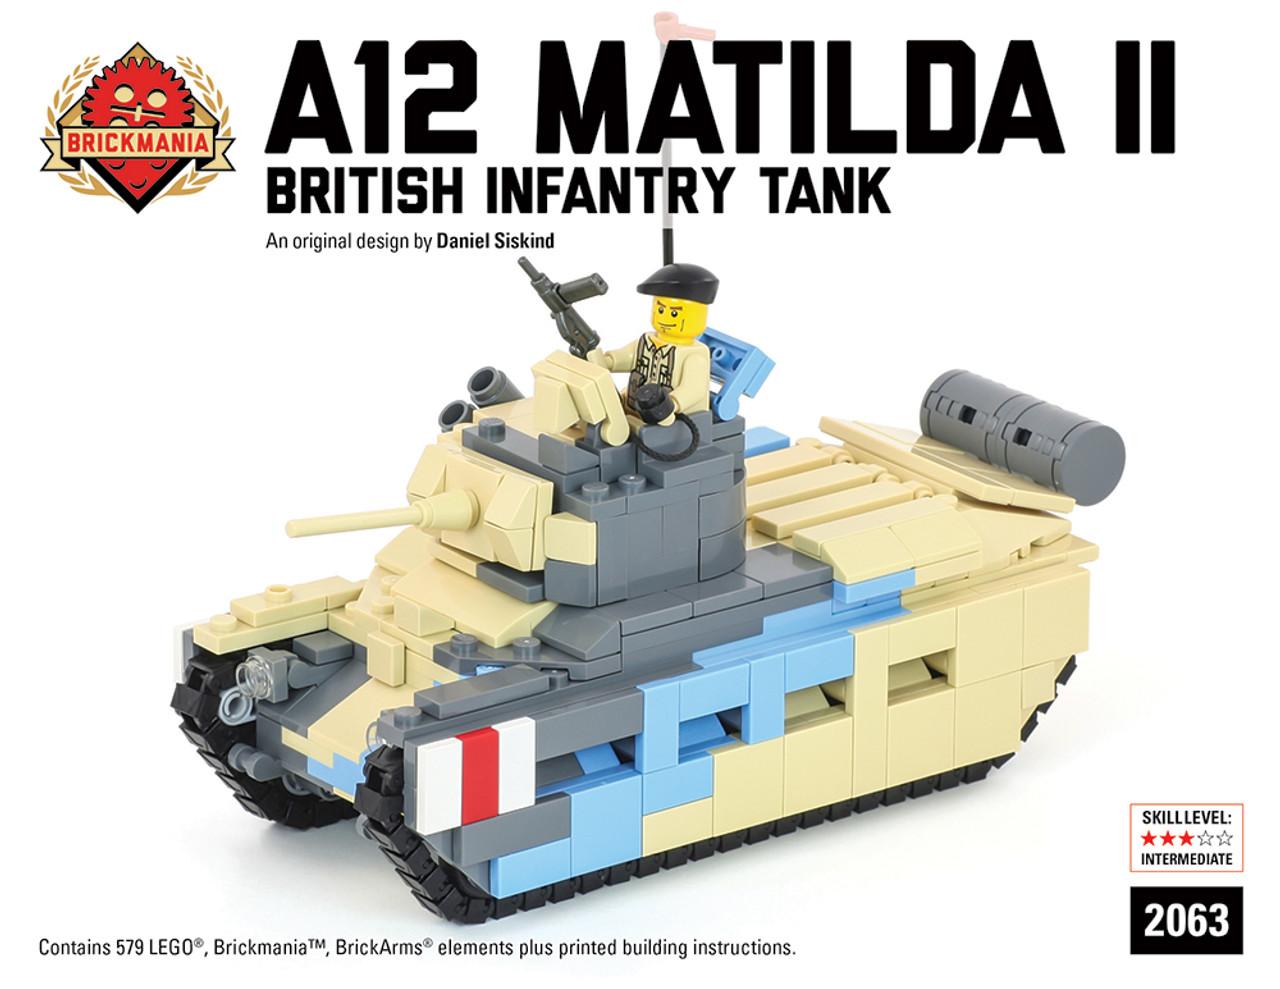 A12 Matilda Ii British Infantry Tank Brickmania Toys